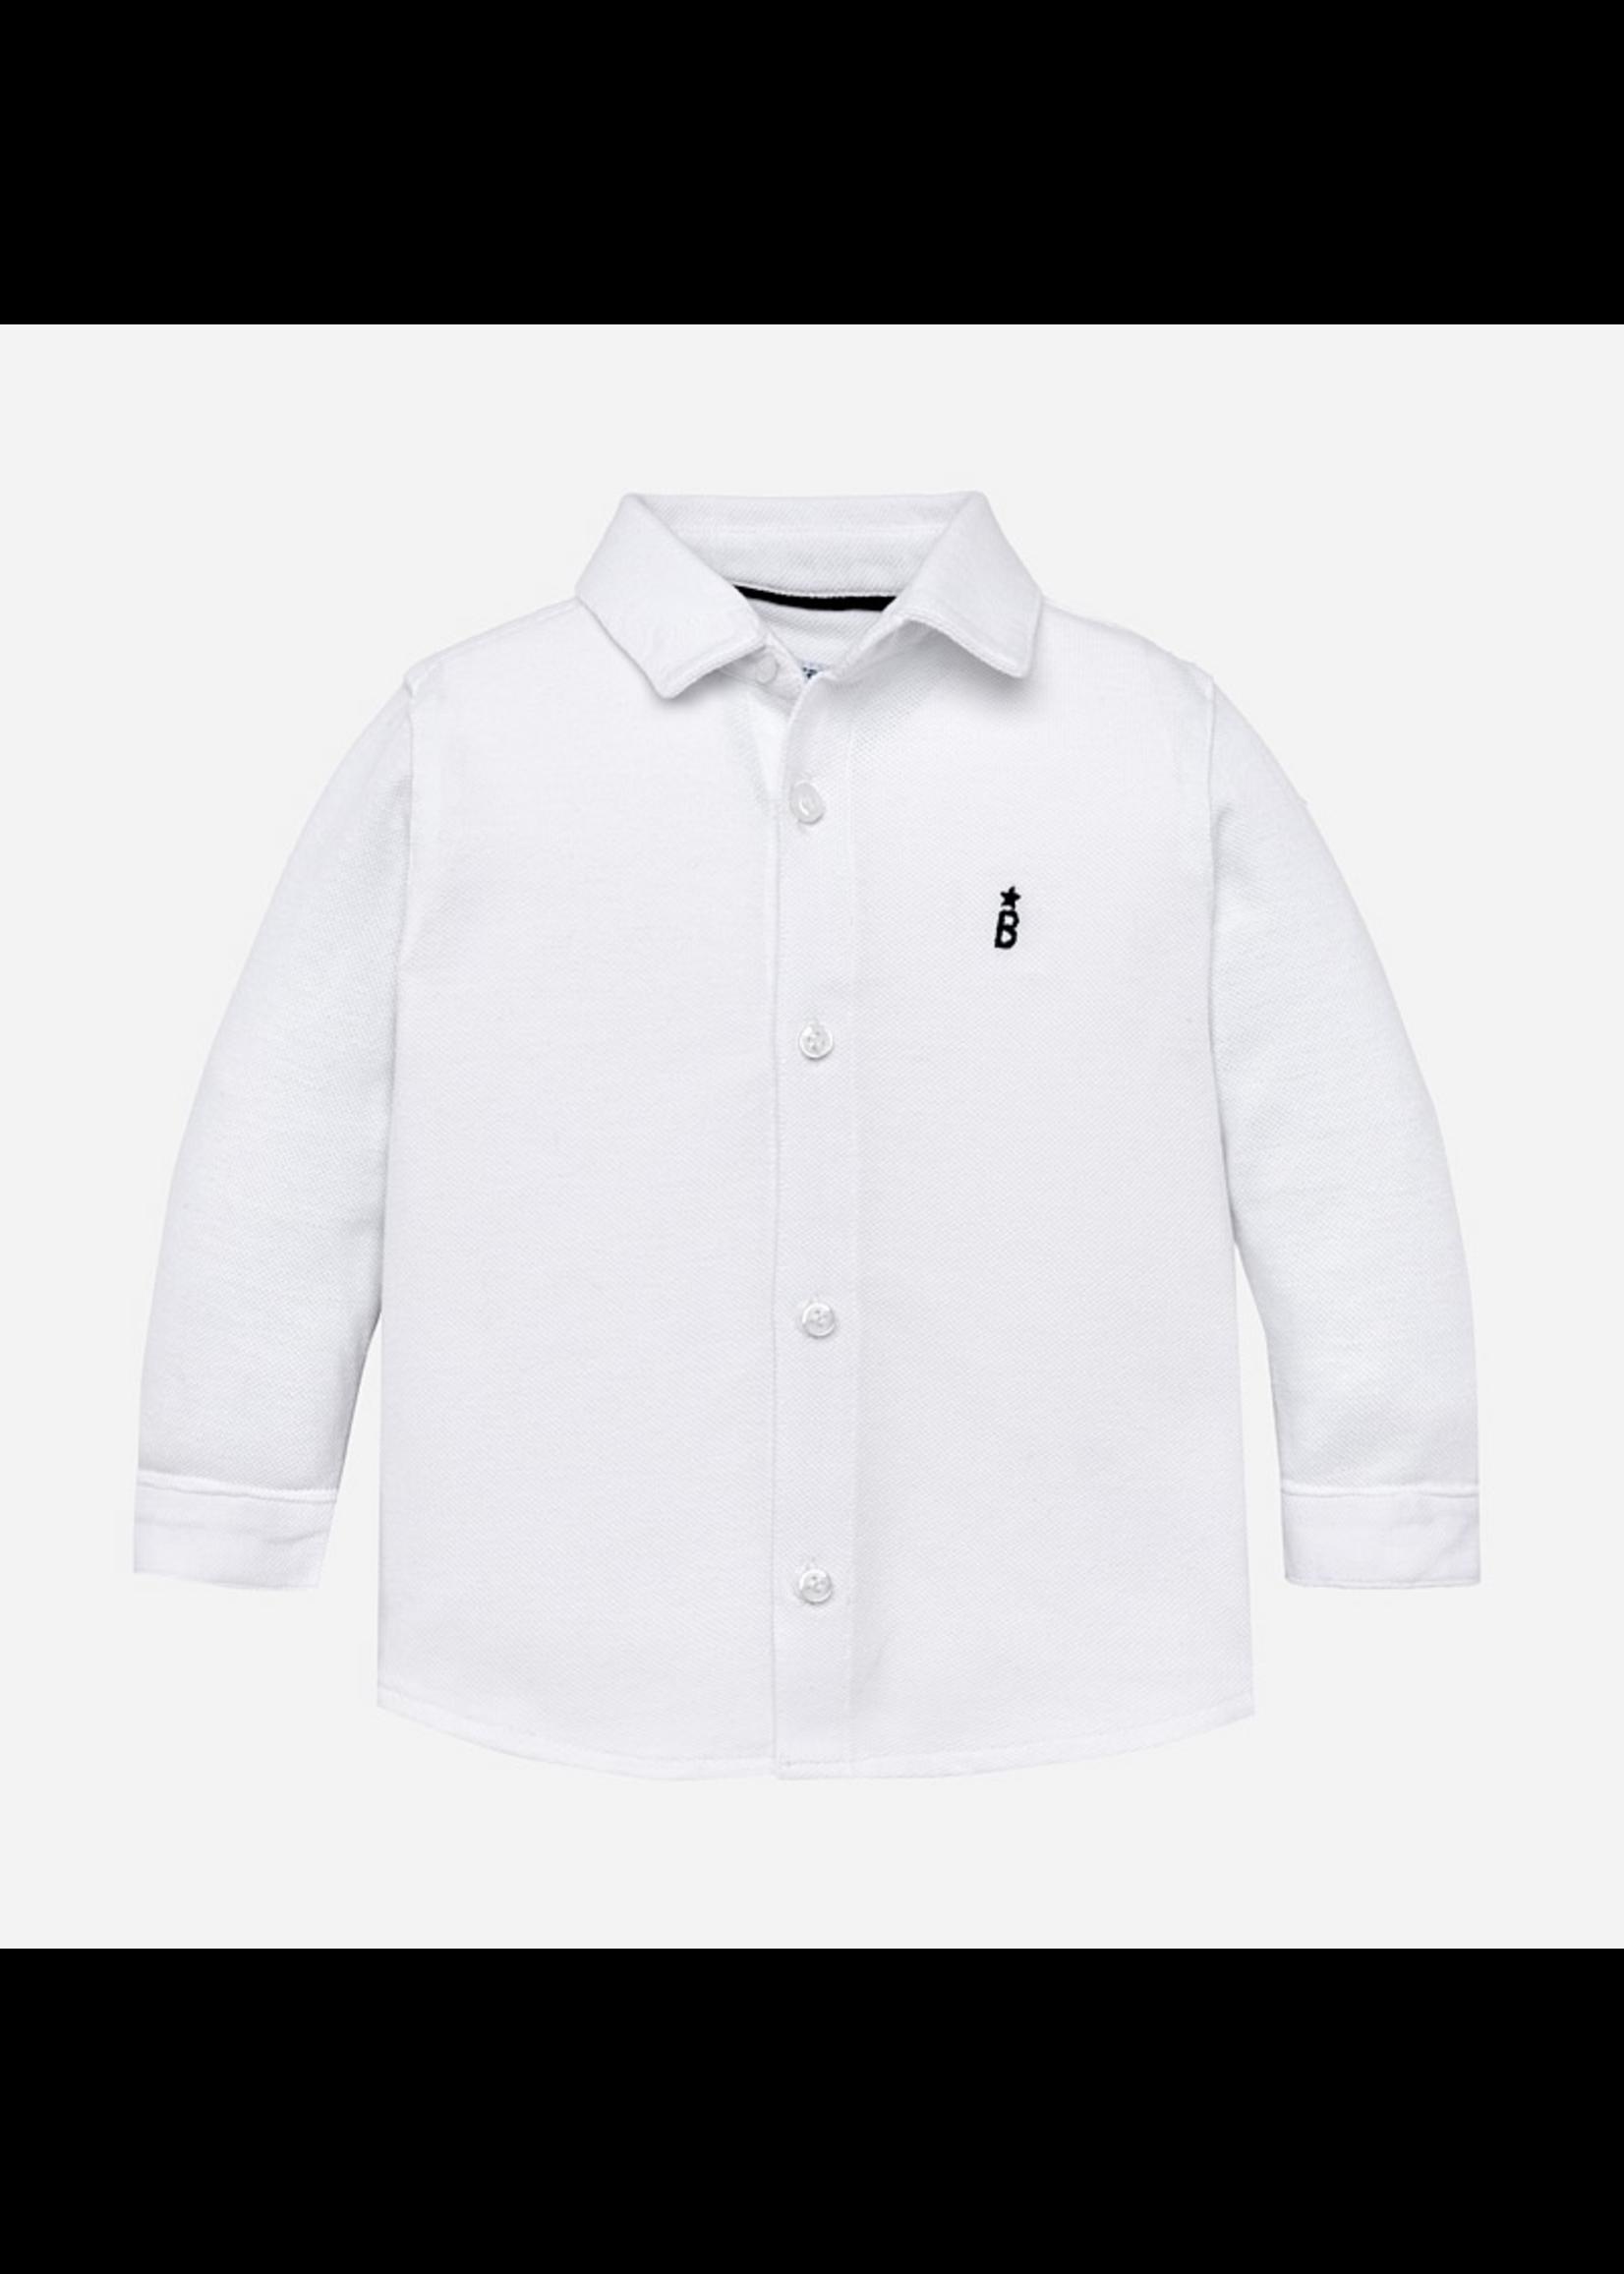 Mayoral Mayoral, Long Sleeved Collard Dress Shirt for Baby Boy